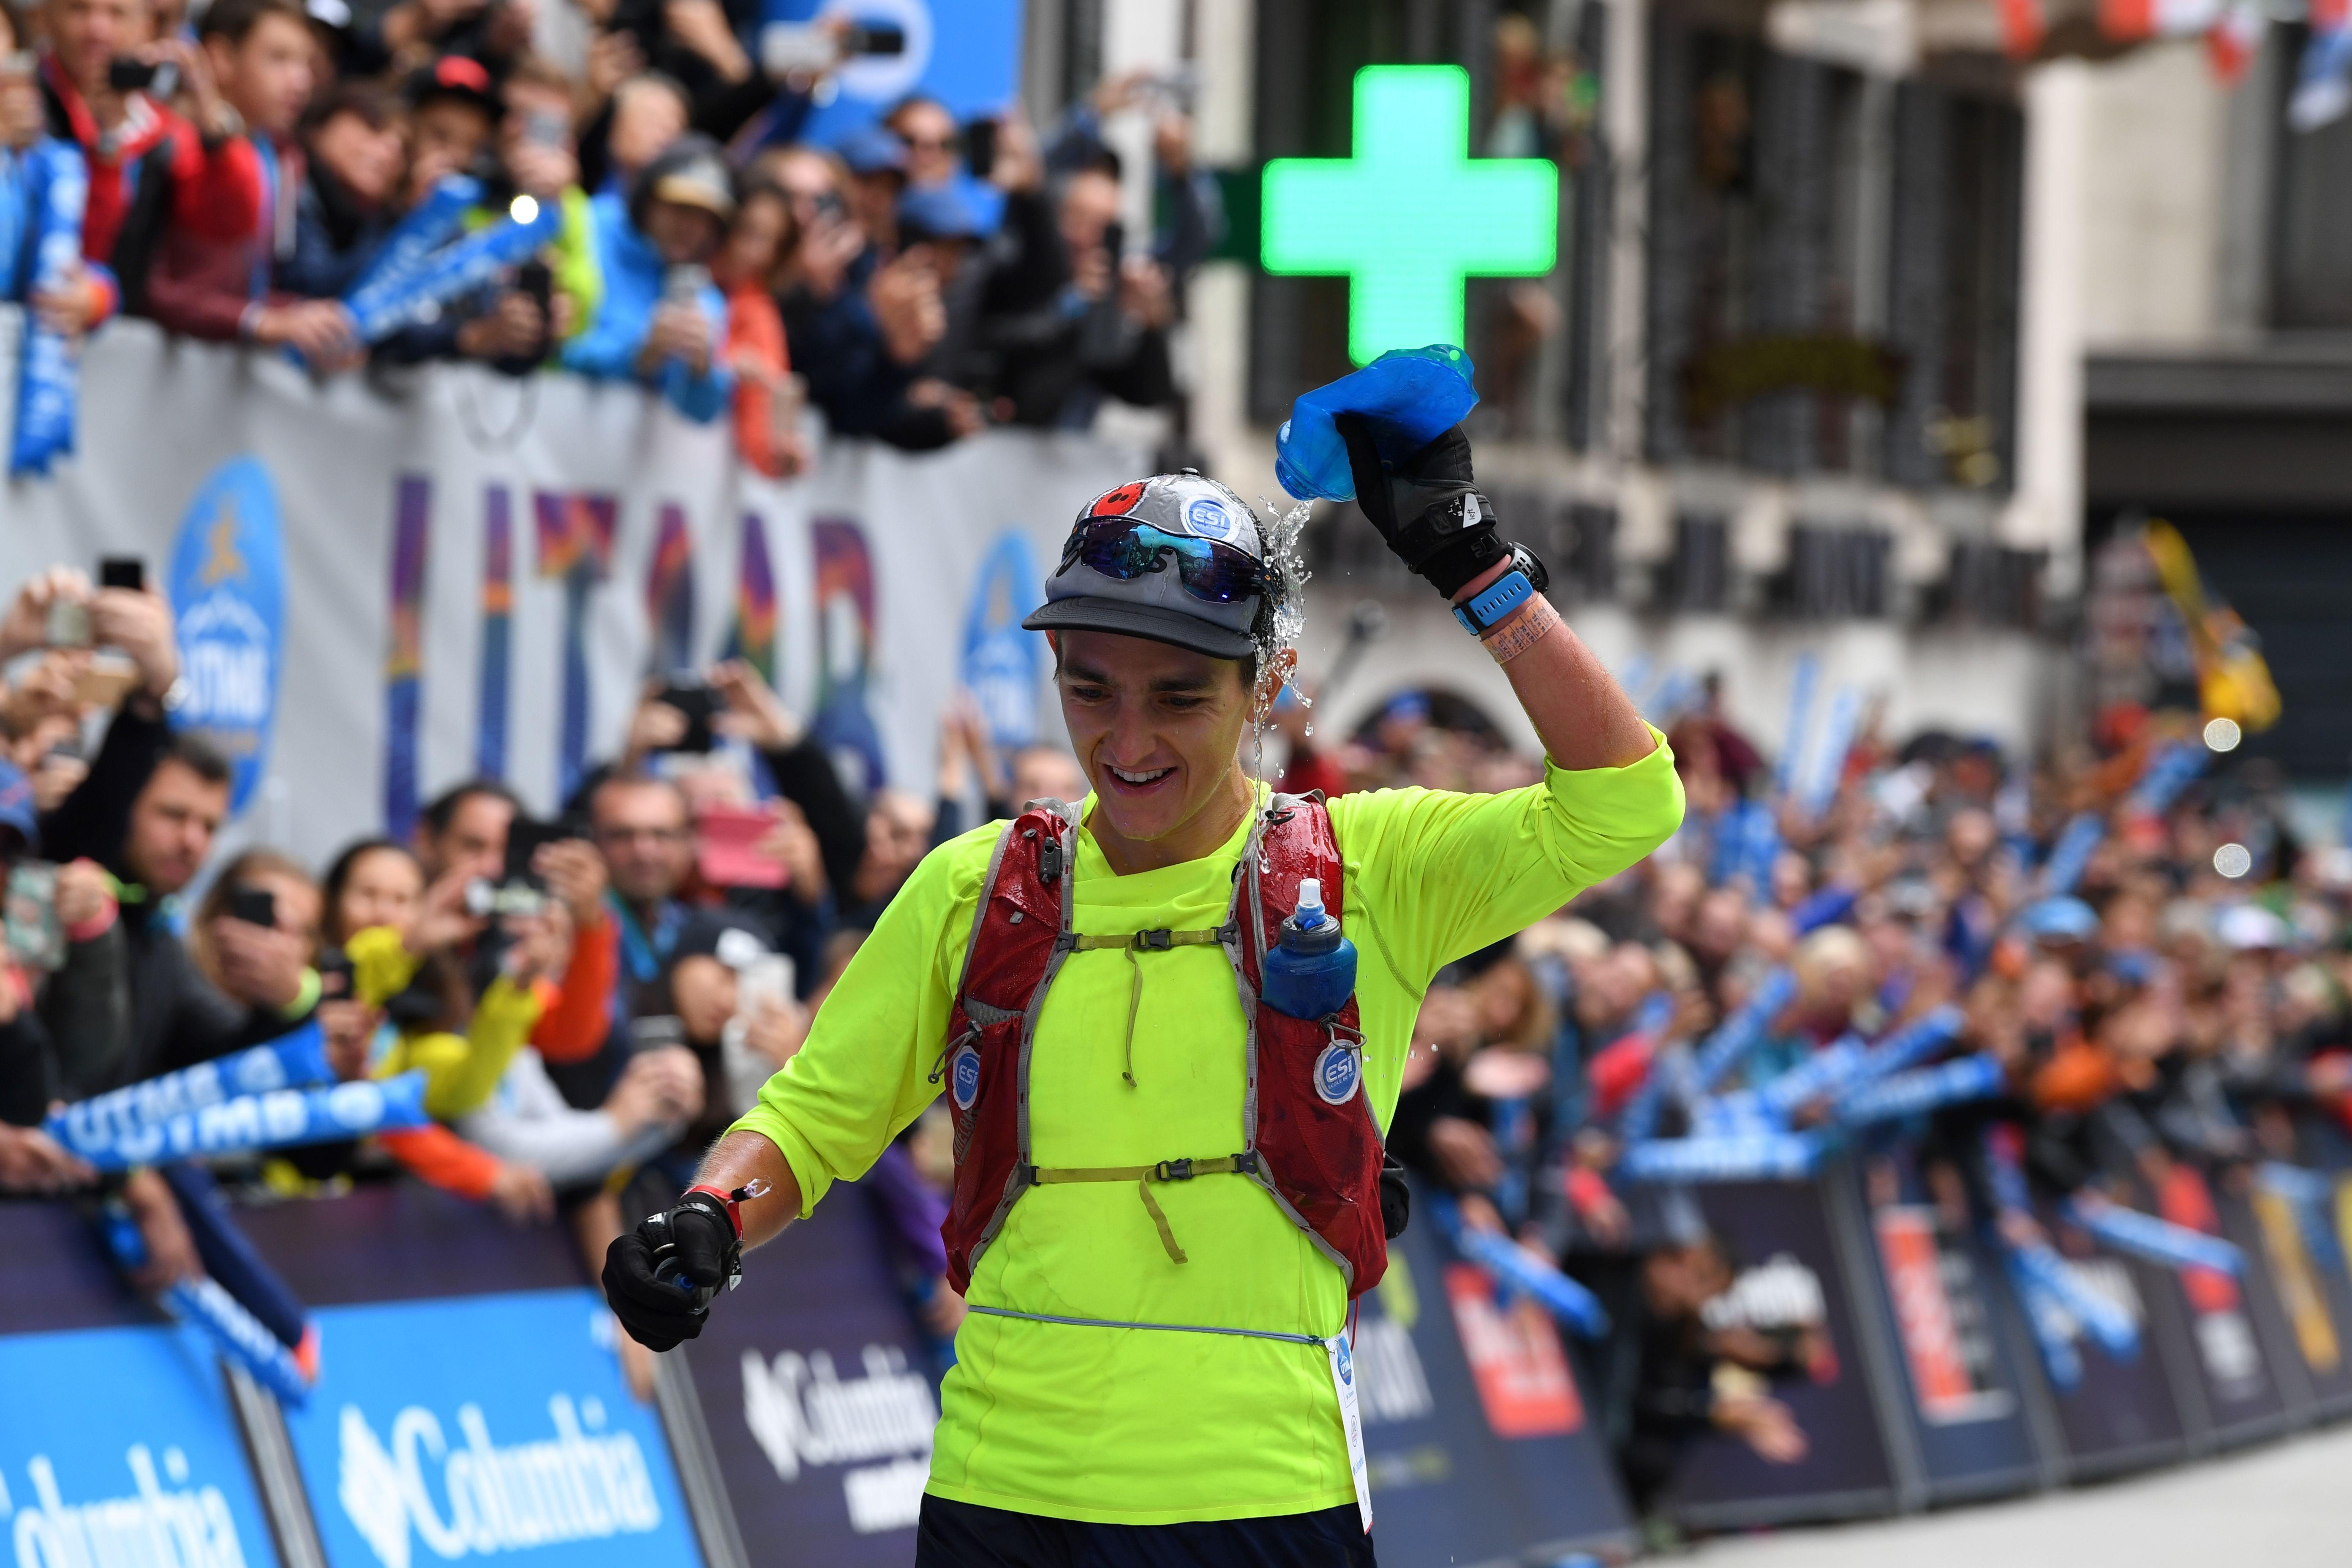 Ultra Trail Du Mont Blanc 2018 Winner Xavier Thévenard Wins For Third Time